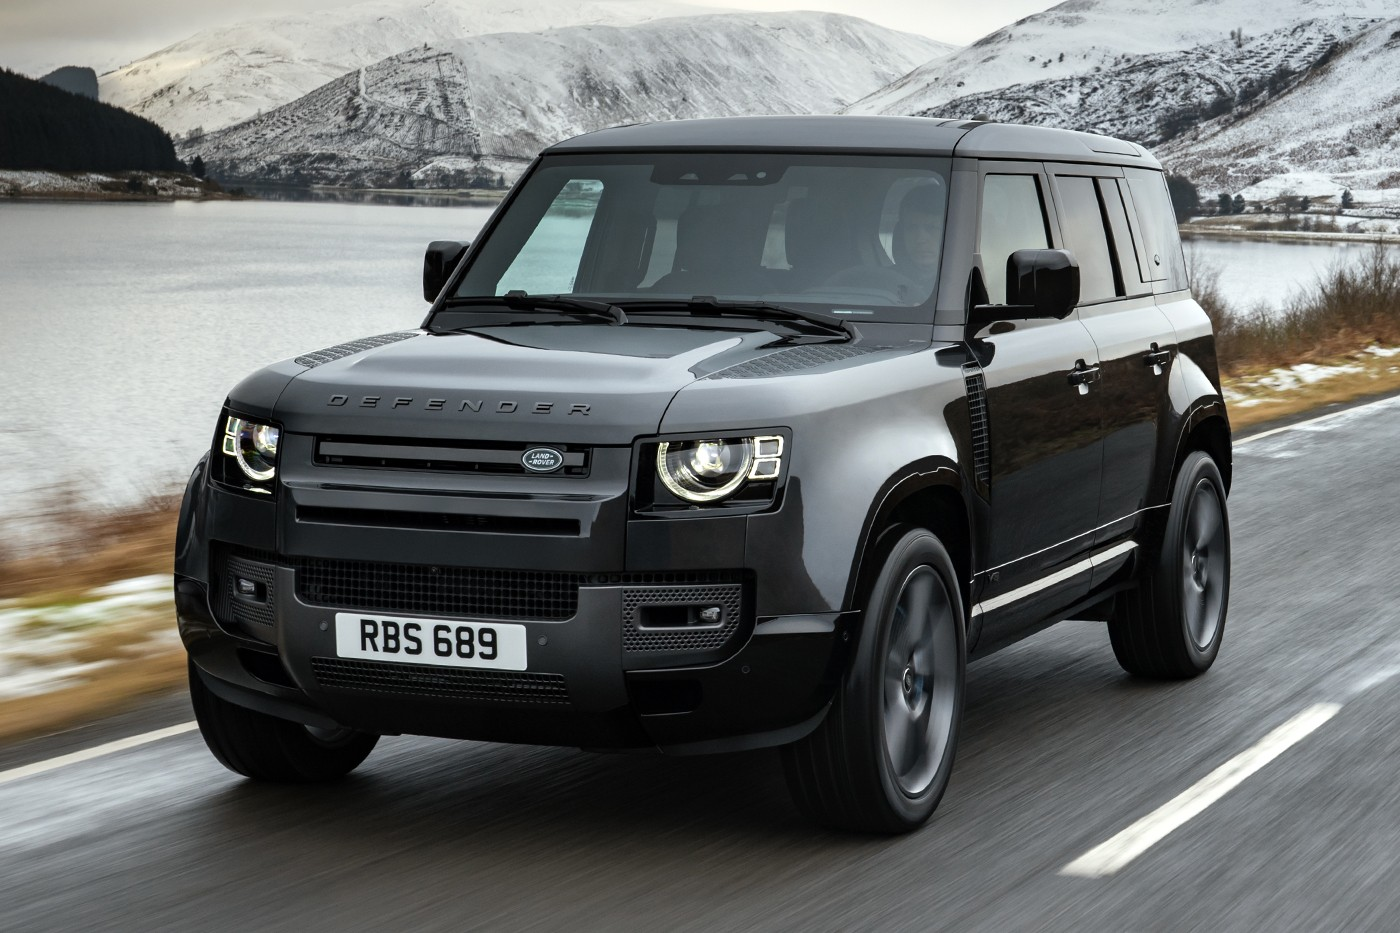 Land Rover Defender 全新 2022 年式样正式发表